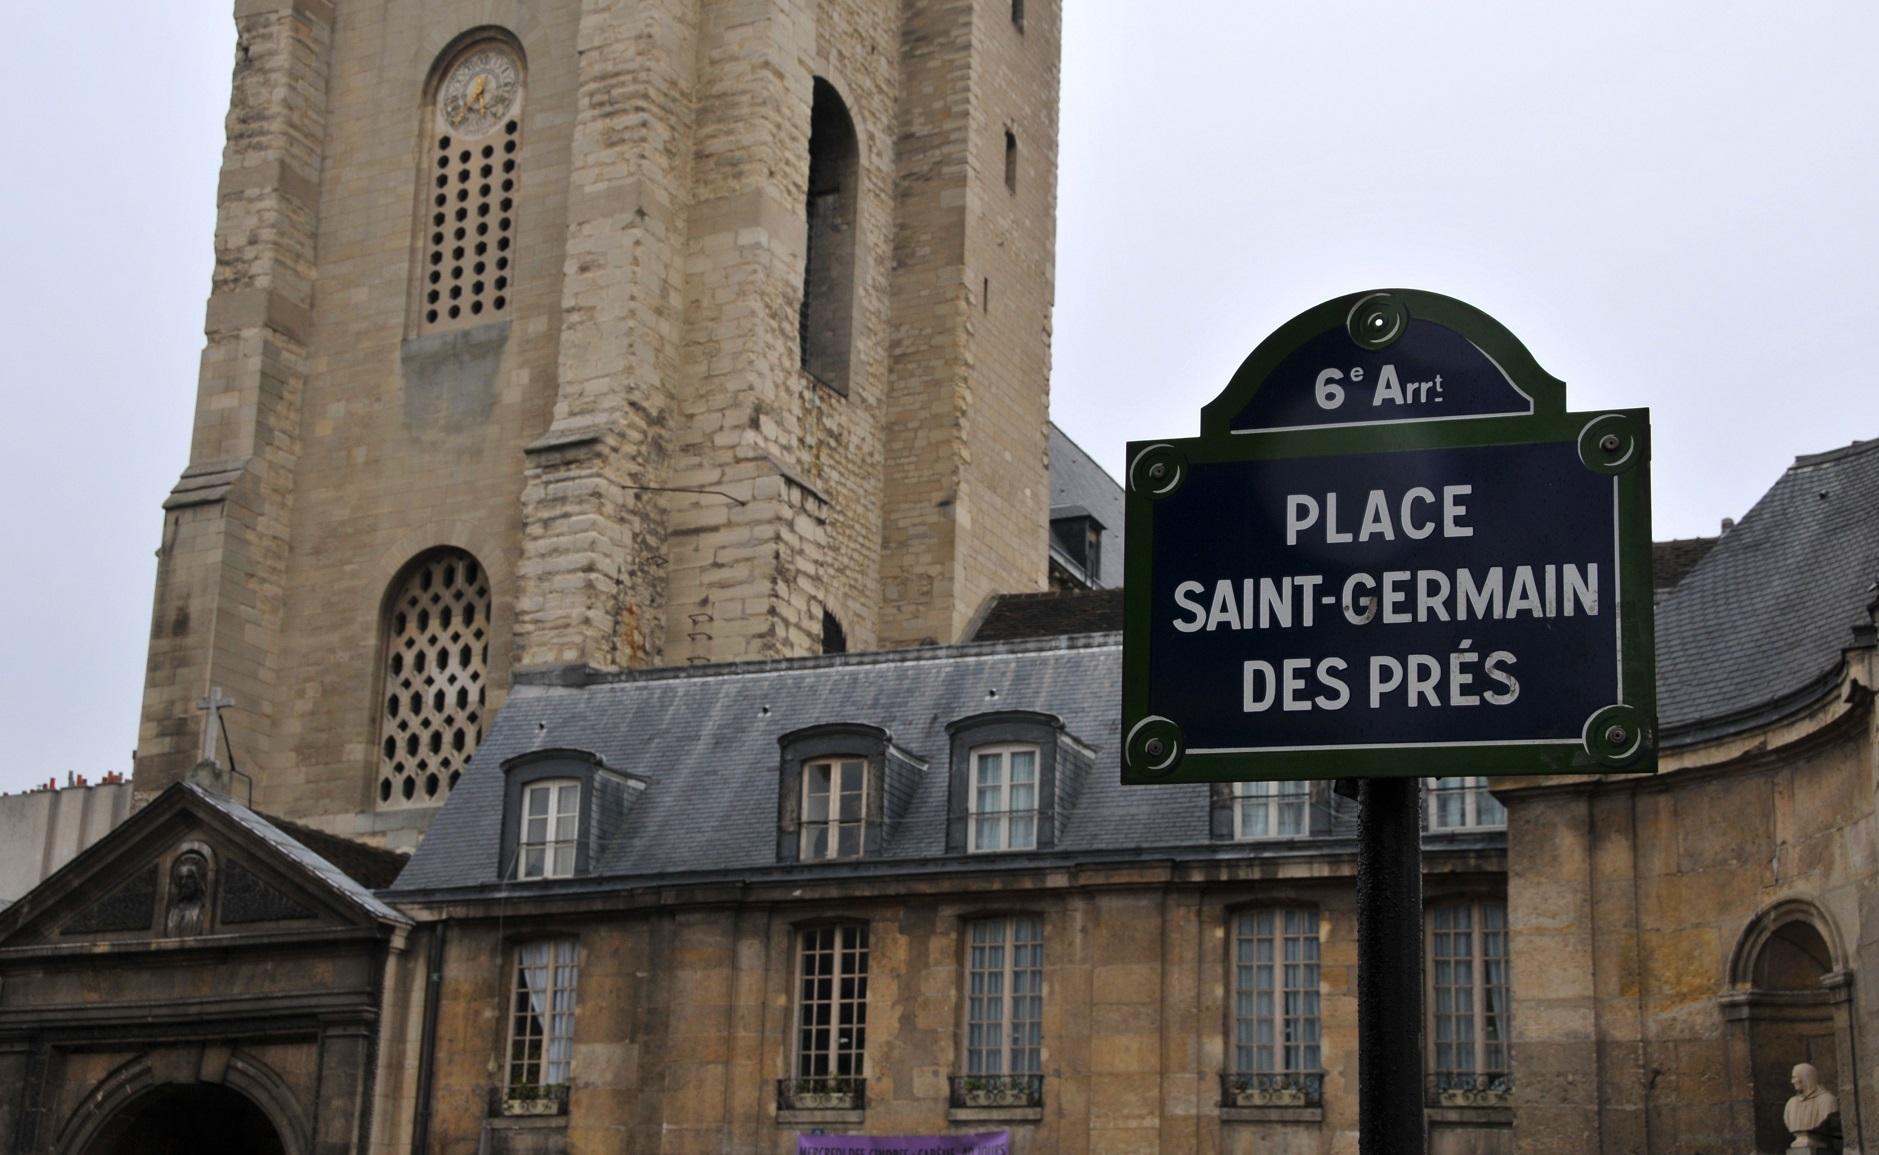 Cosa vedere nel quartiere di Sant Germain des Prés